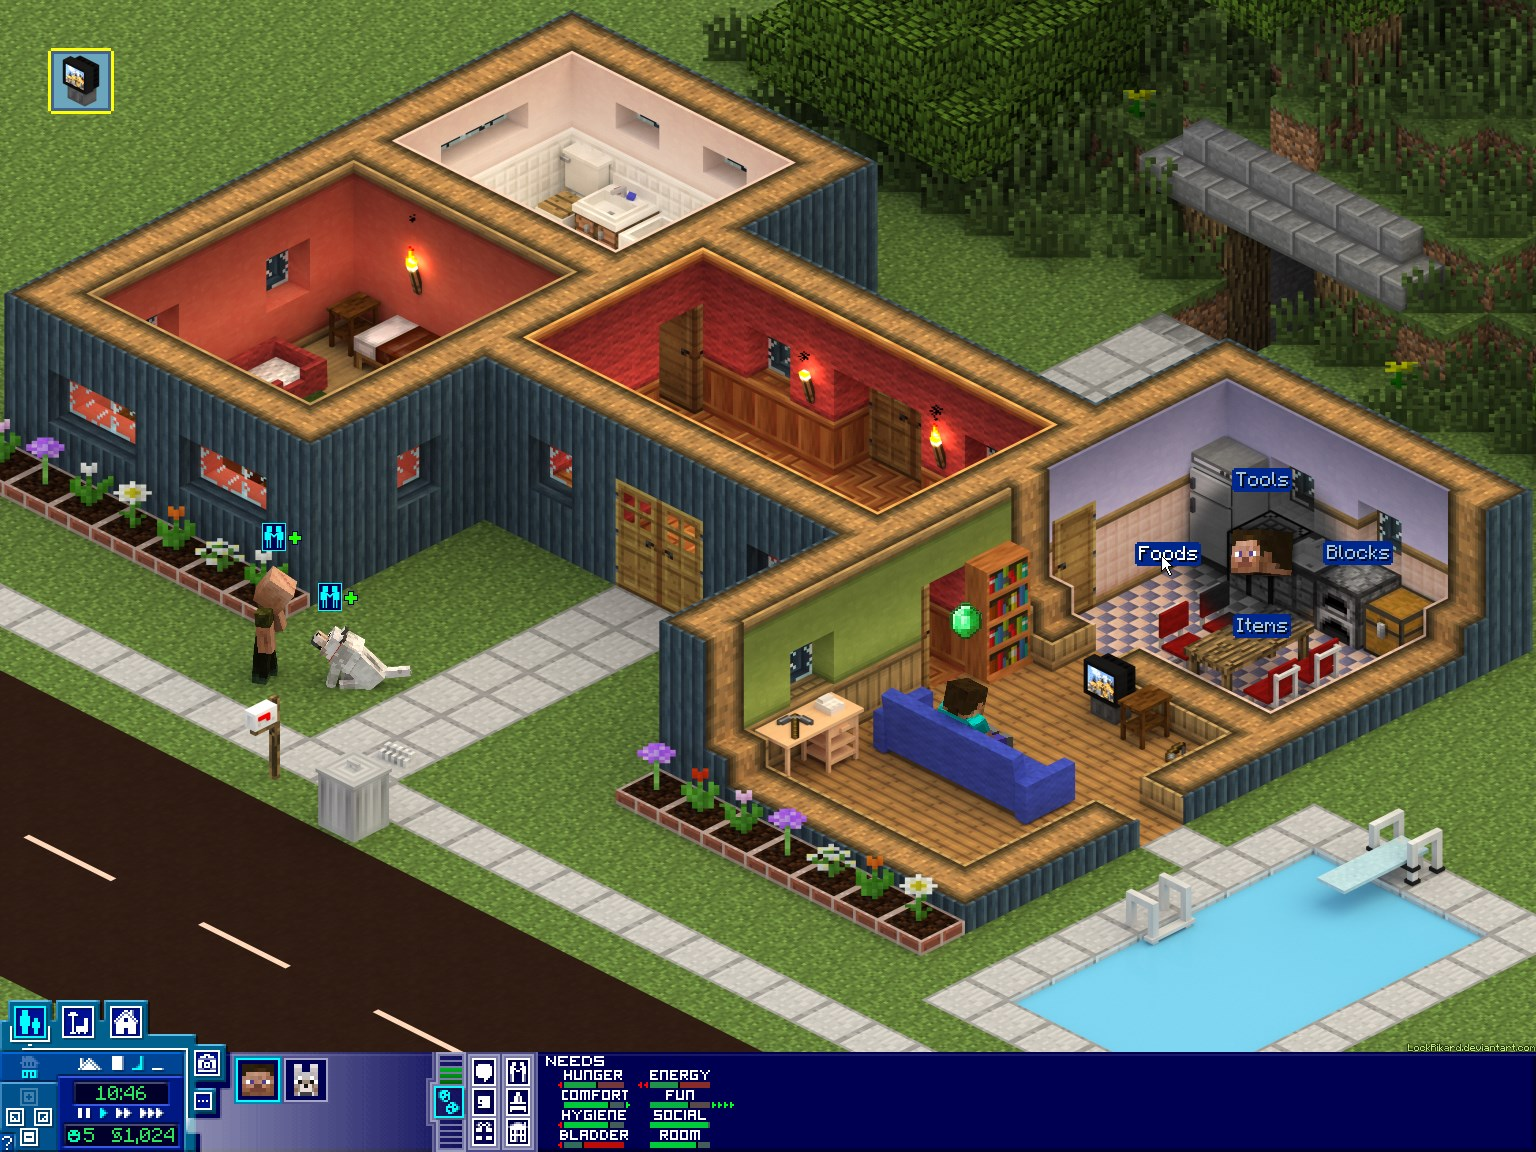 Sims 3 vore mod porncraft womens